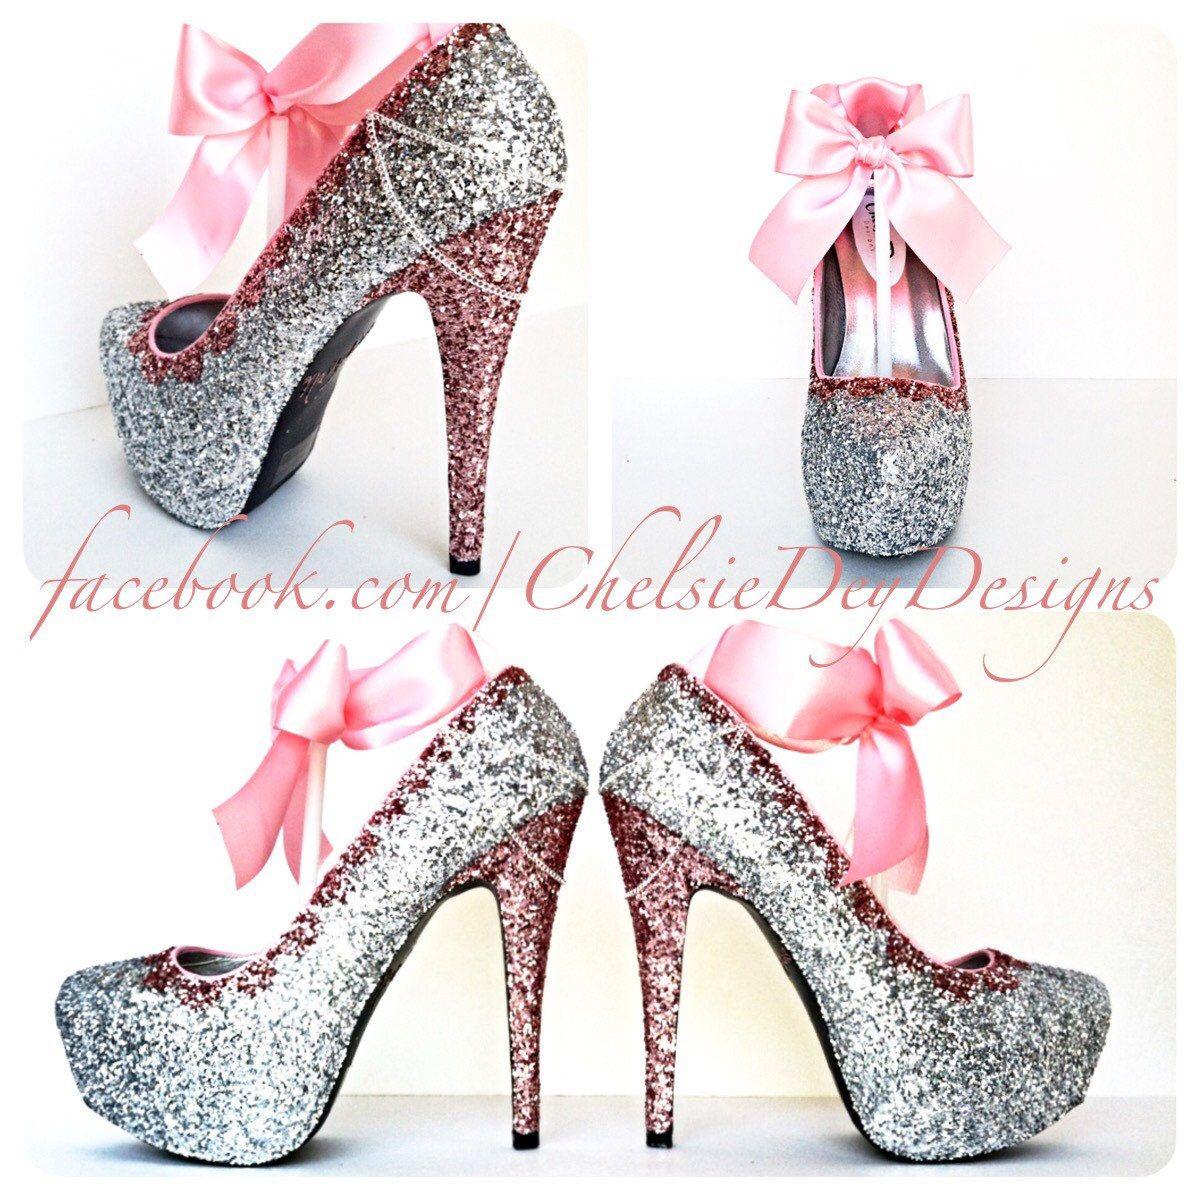 glitter high heels pink and silver pumps bubblegum light pink platform shoes glitzy